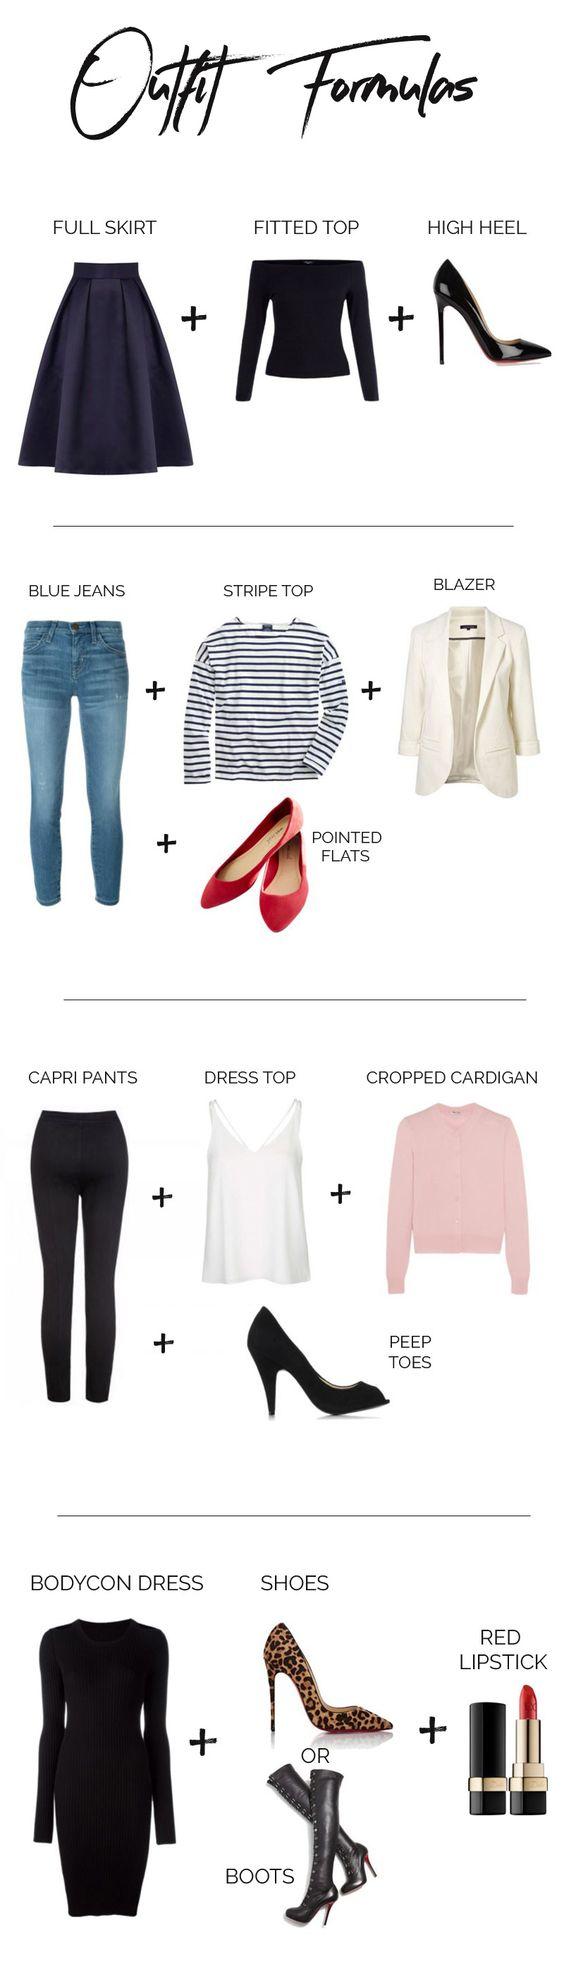 blog sittakarina - trik shopping baju murah tapi trendy